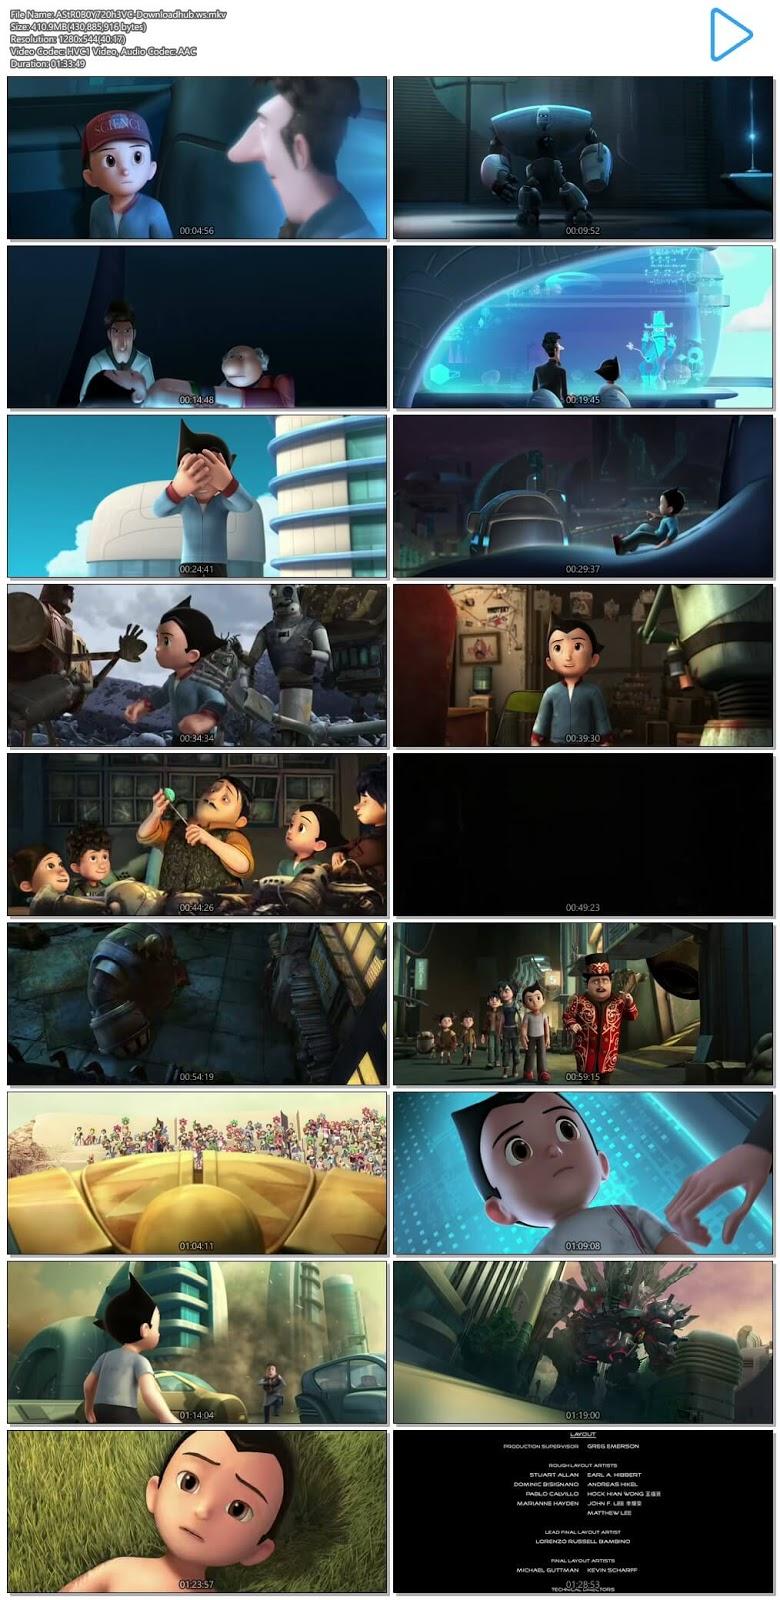 Astro Boy 2009 Hindi Dual Audio 720p HEVC BluRay Free Download